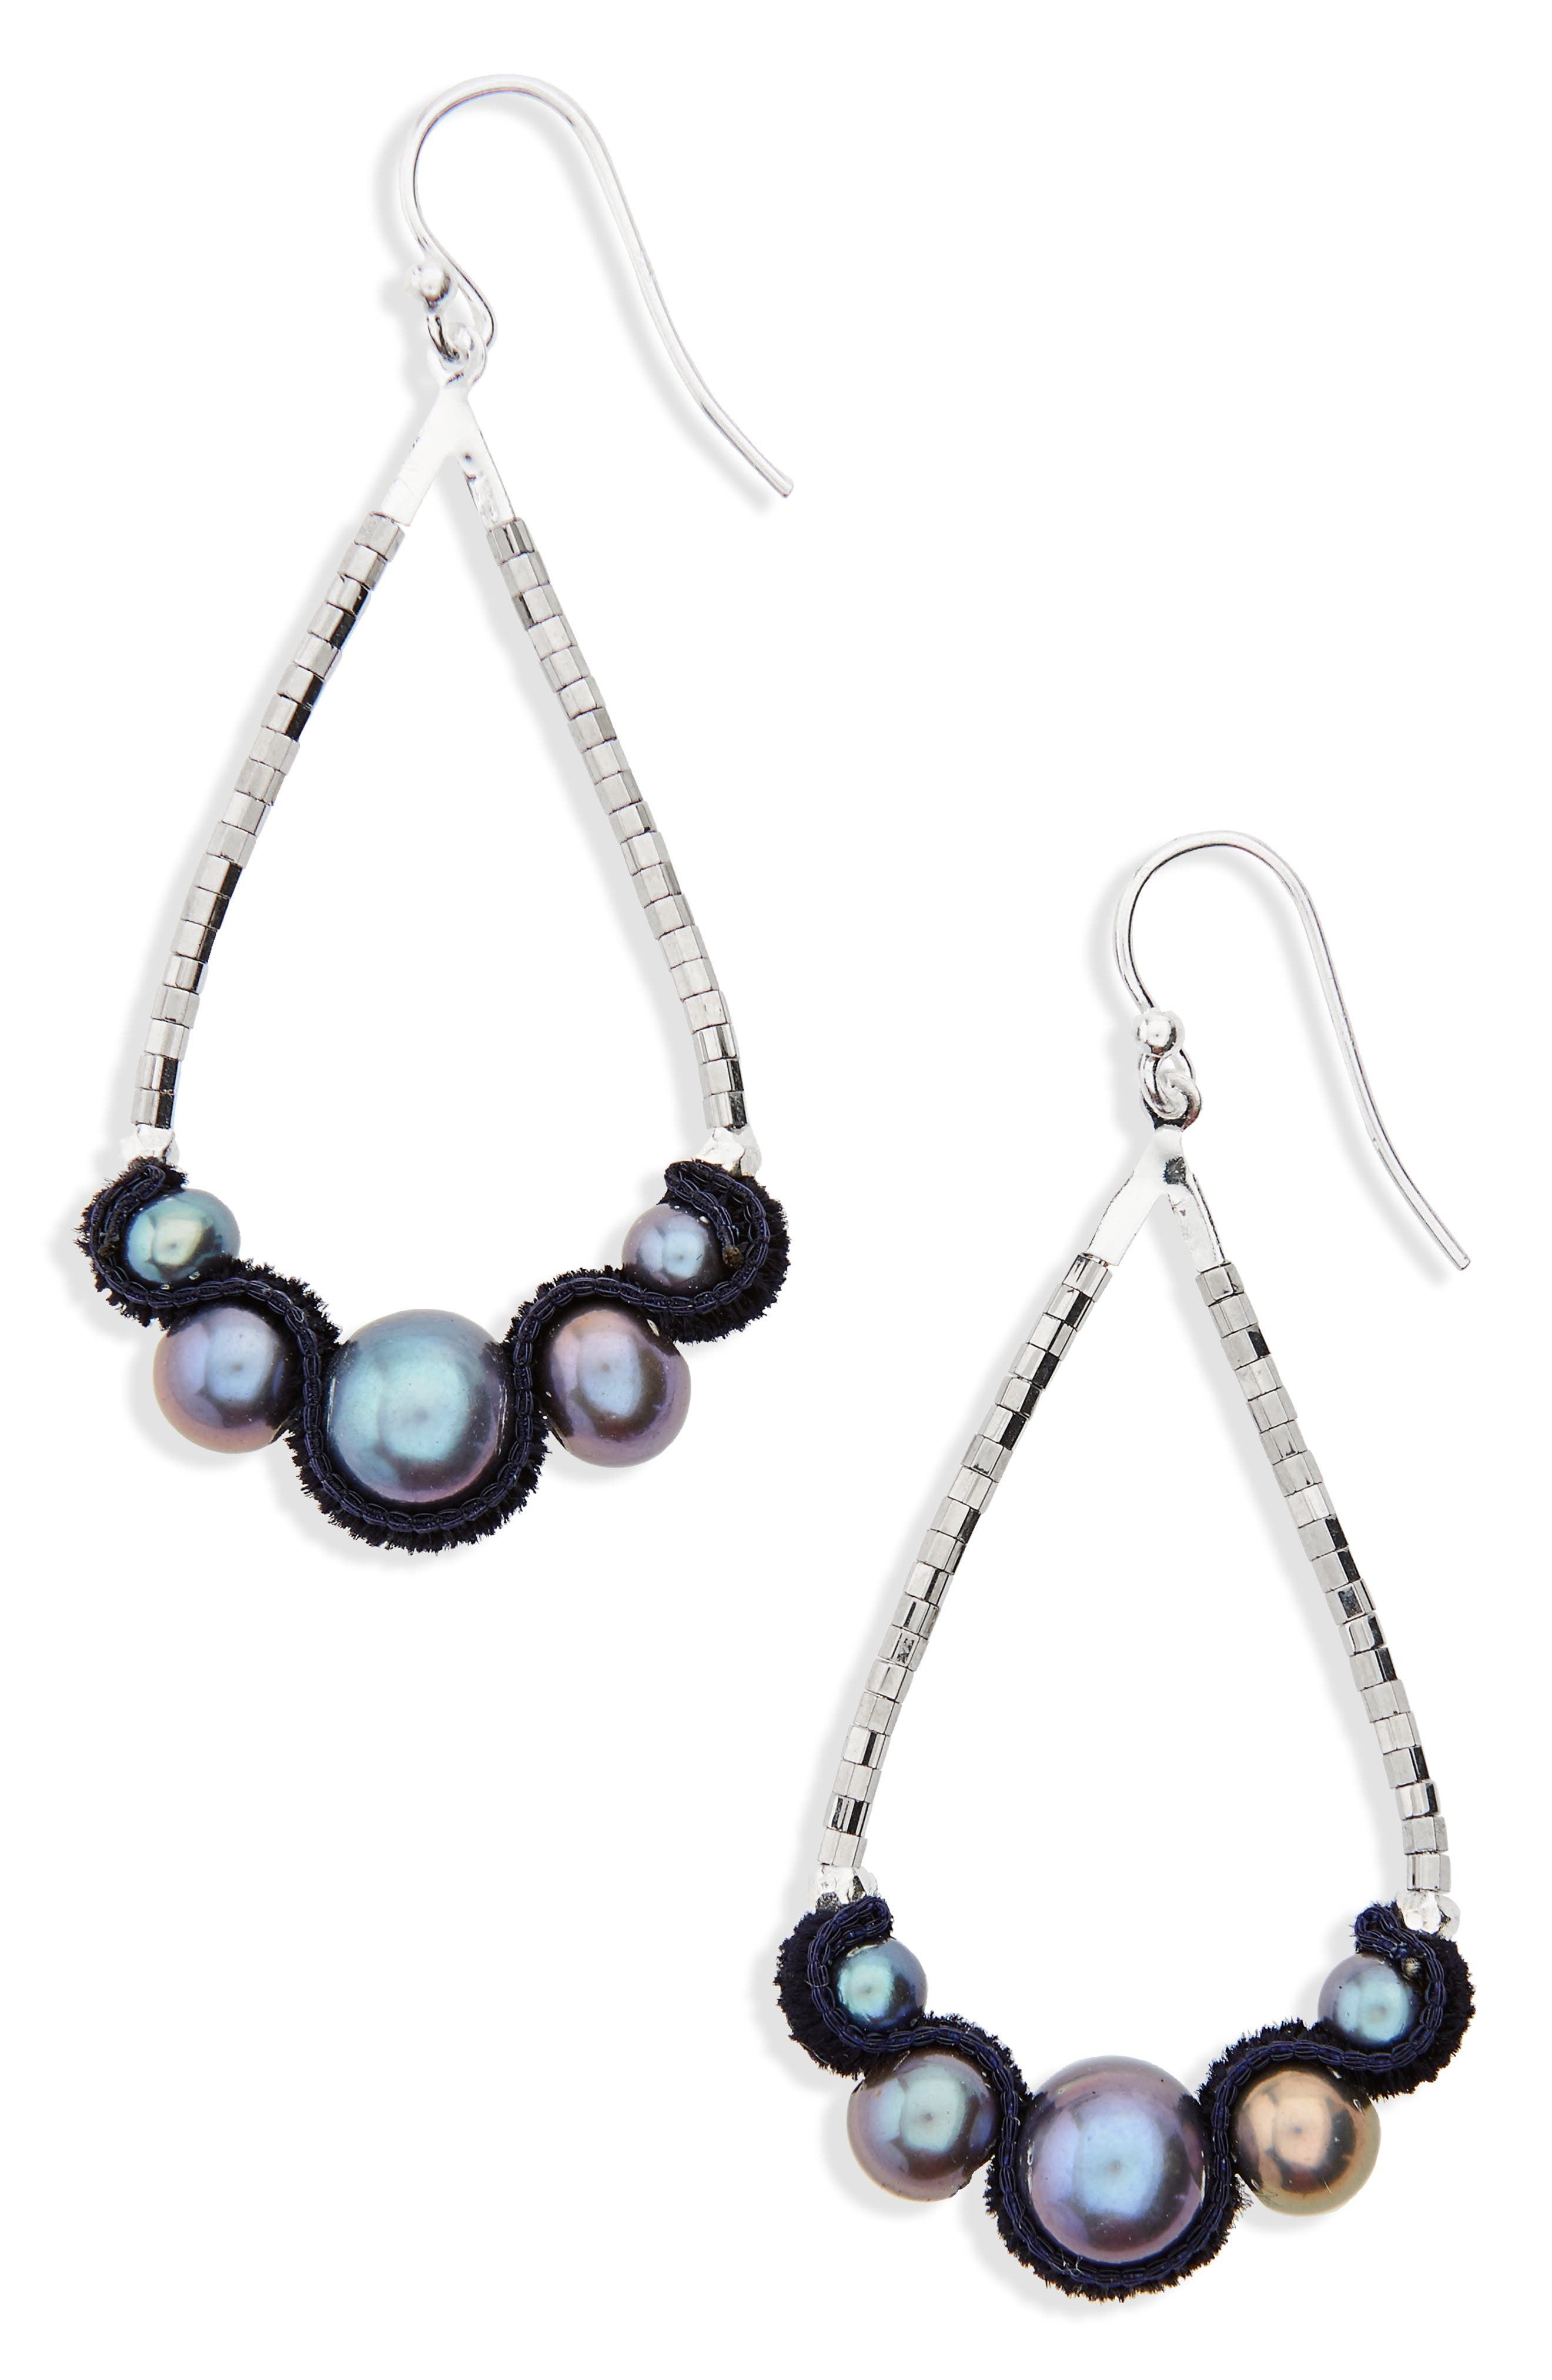 Velvet & Pearl Drop Earrings,                             Main thumbnail 1, color,                             Peacock Blue Pearl